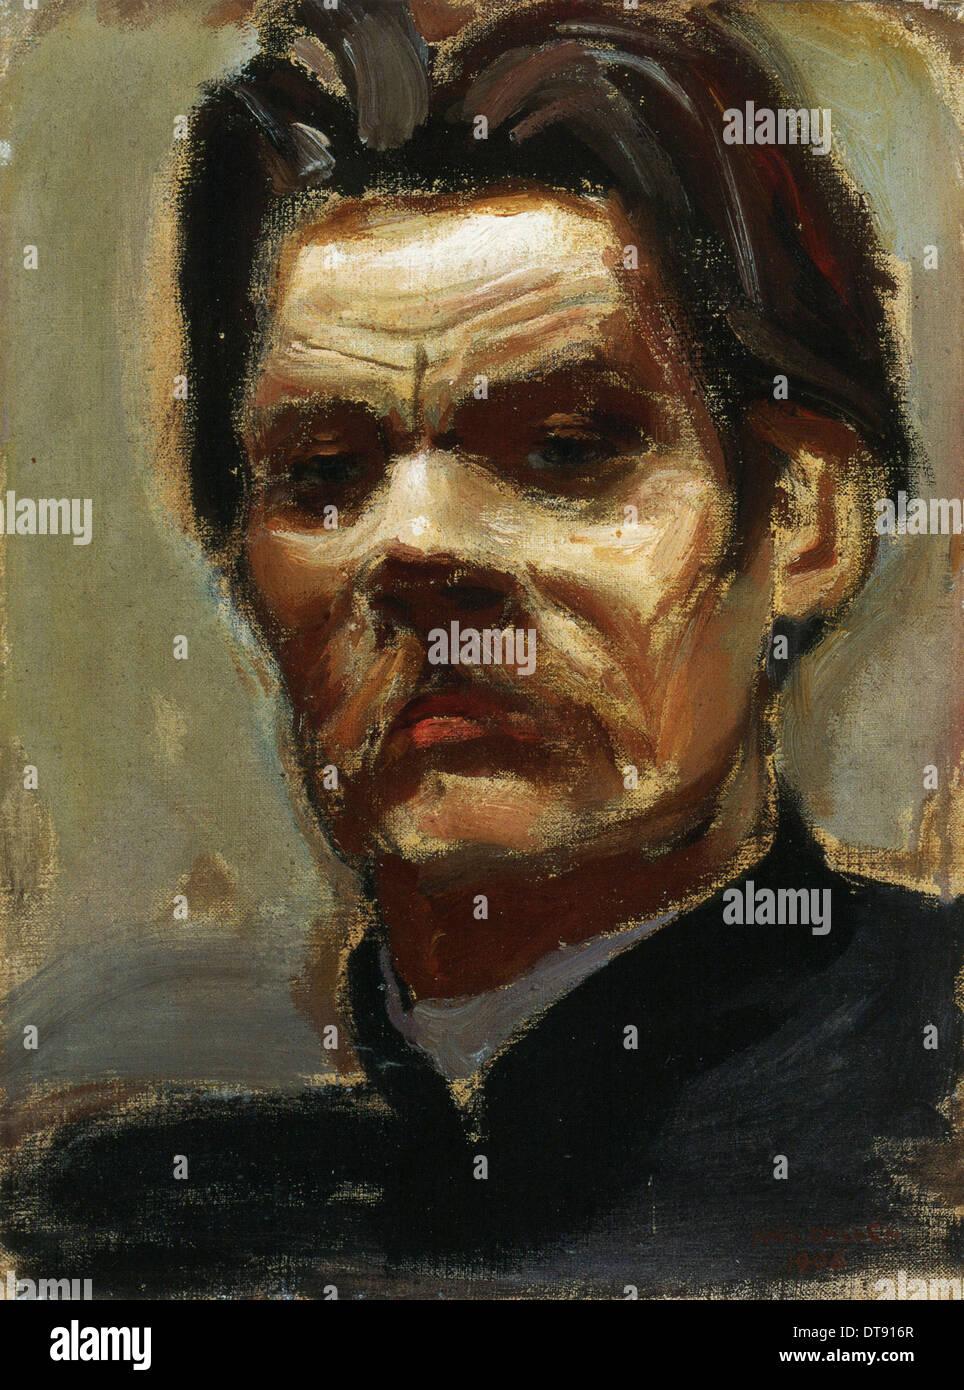 Portrait of the author Maxim Gorky (1868-1939), 1906. Artist: Gallen-Kallela, Akseli (1865-1931) - Stock Image